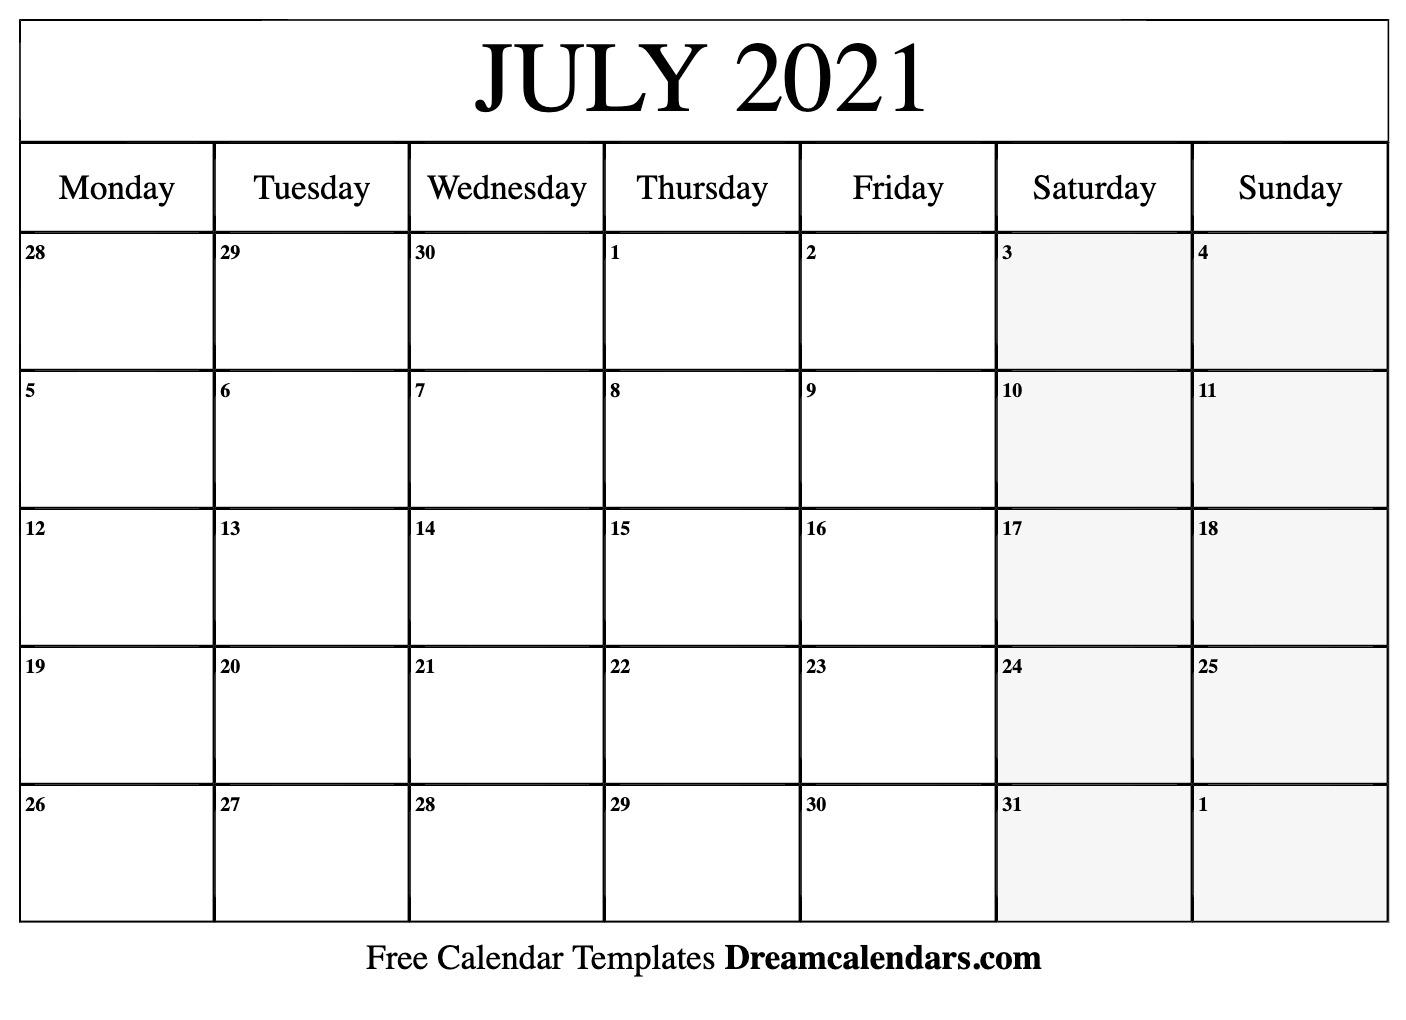 July 2021 Calendar | Free Blank Printable Templates